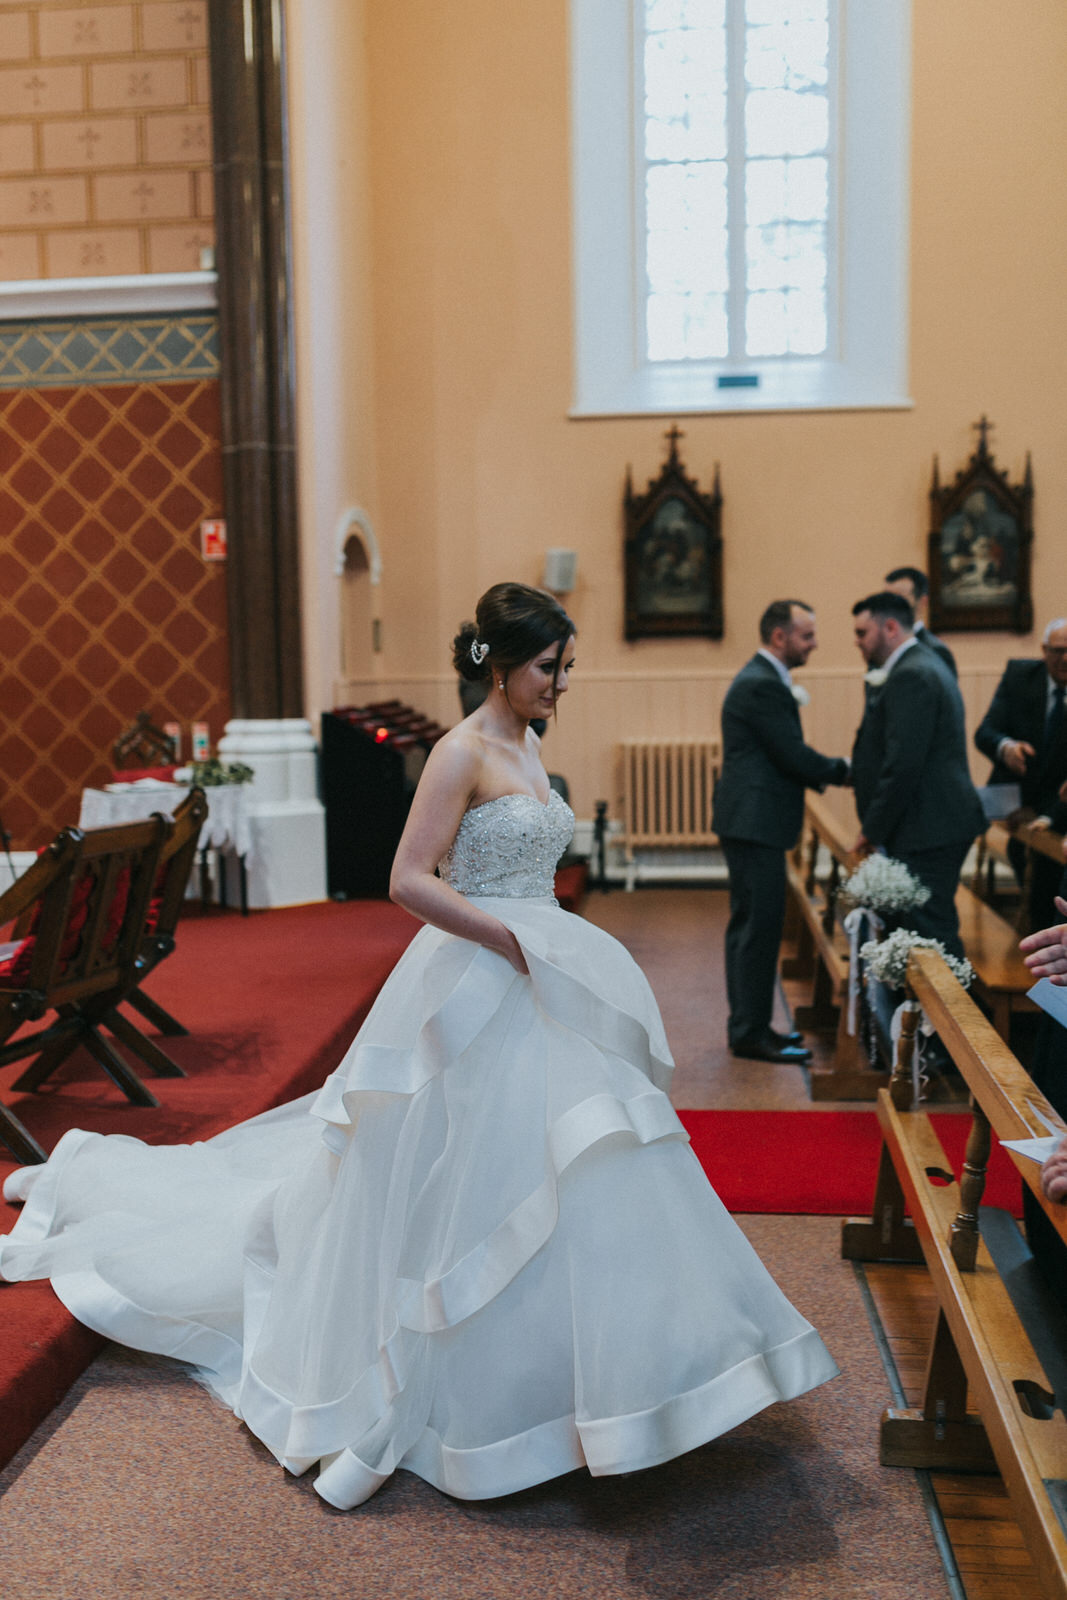 Clonabreany_wedding-photographer_roger_kenny_ireland_051.jpg